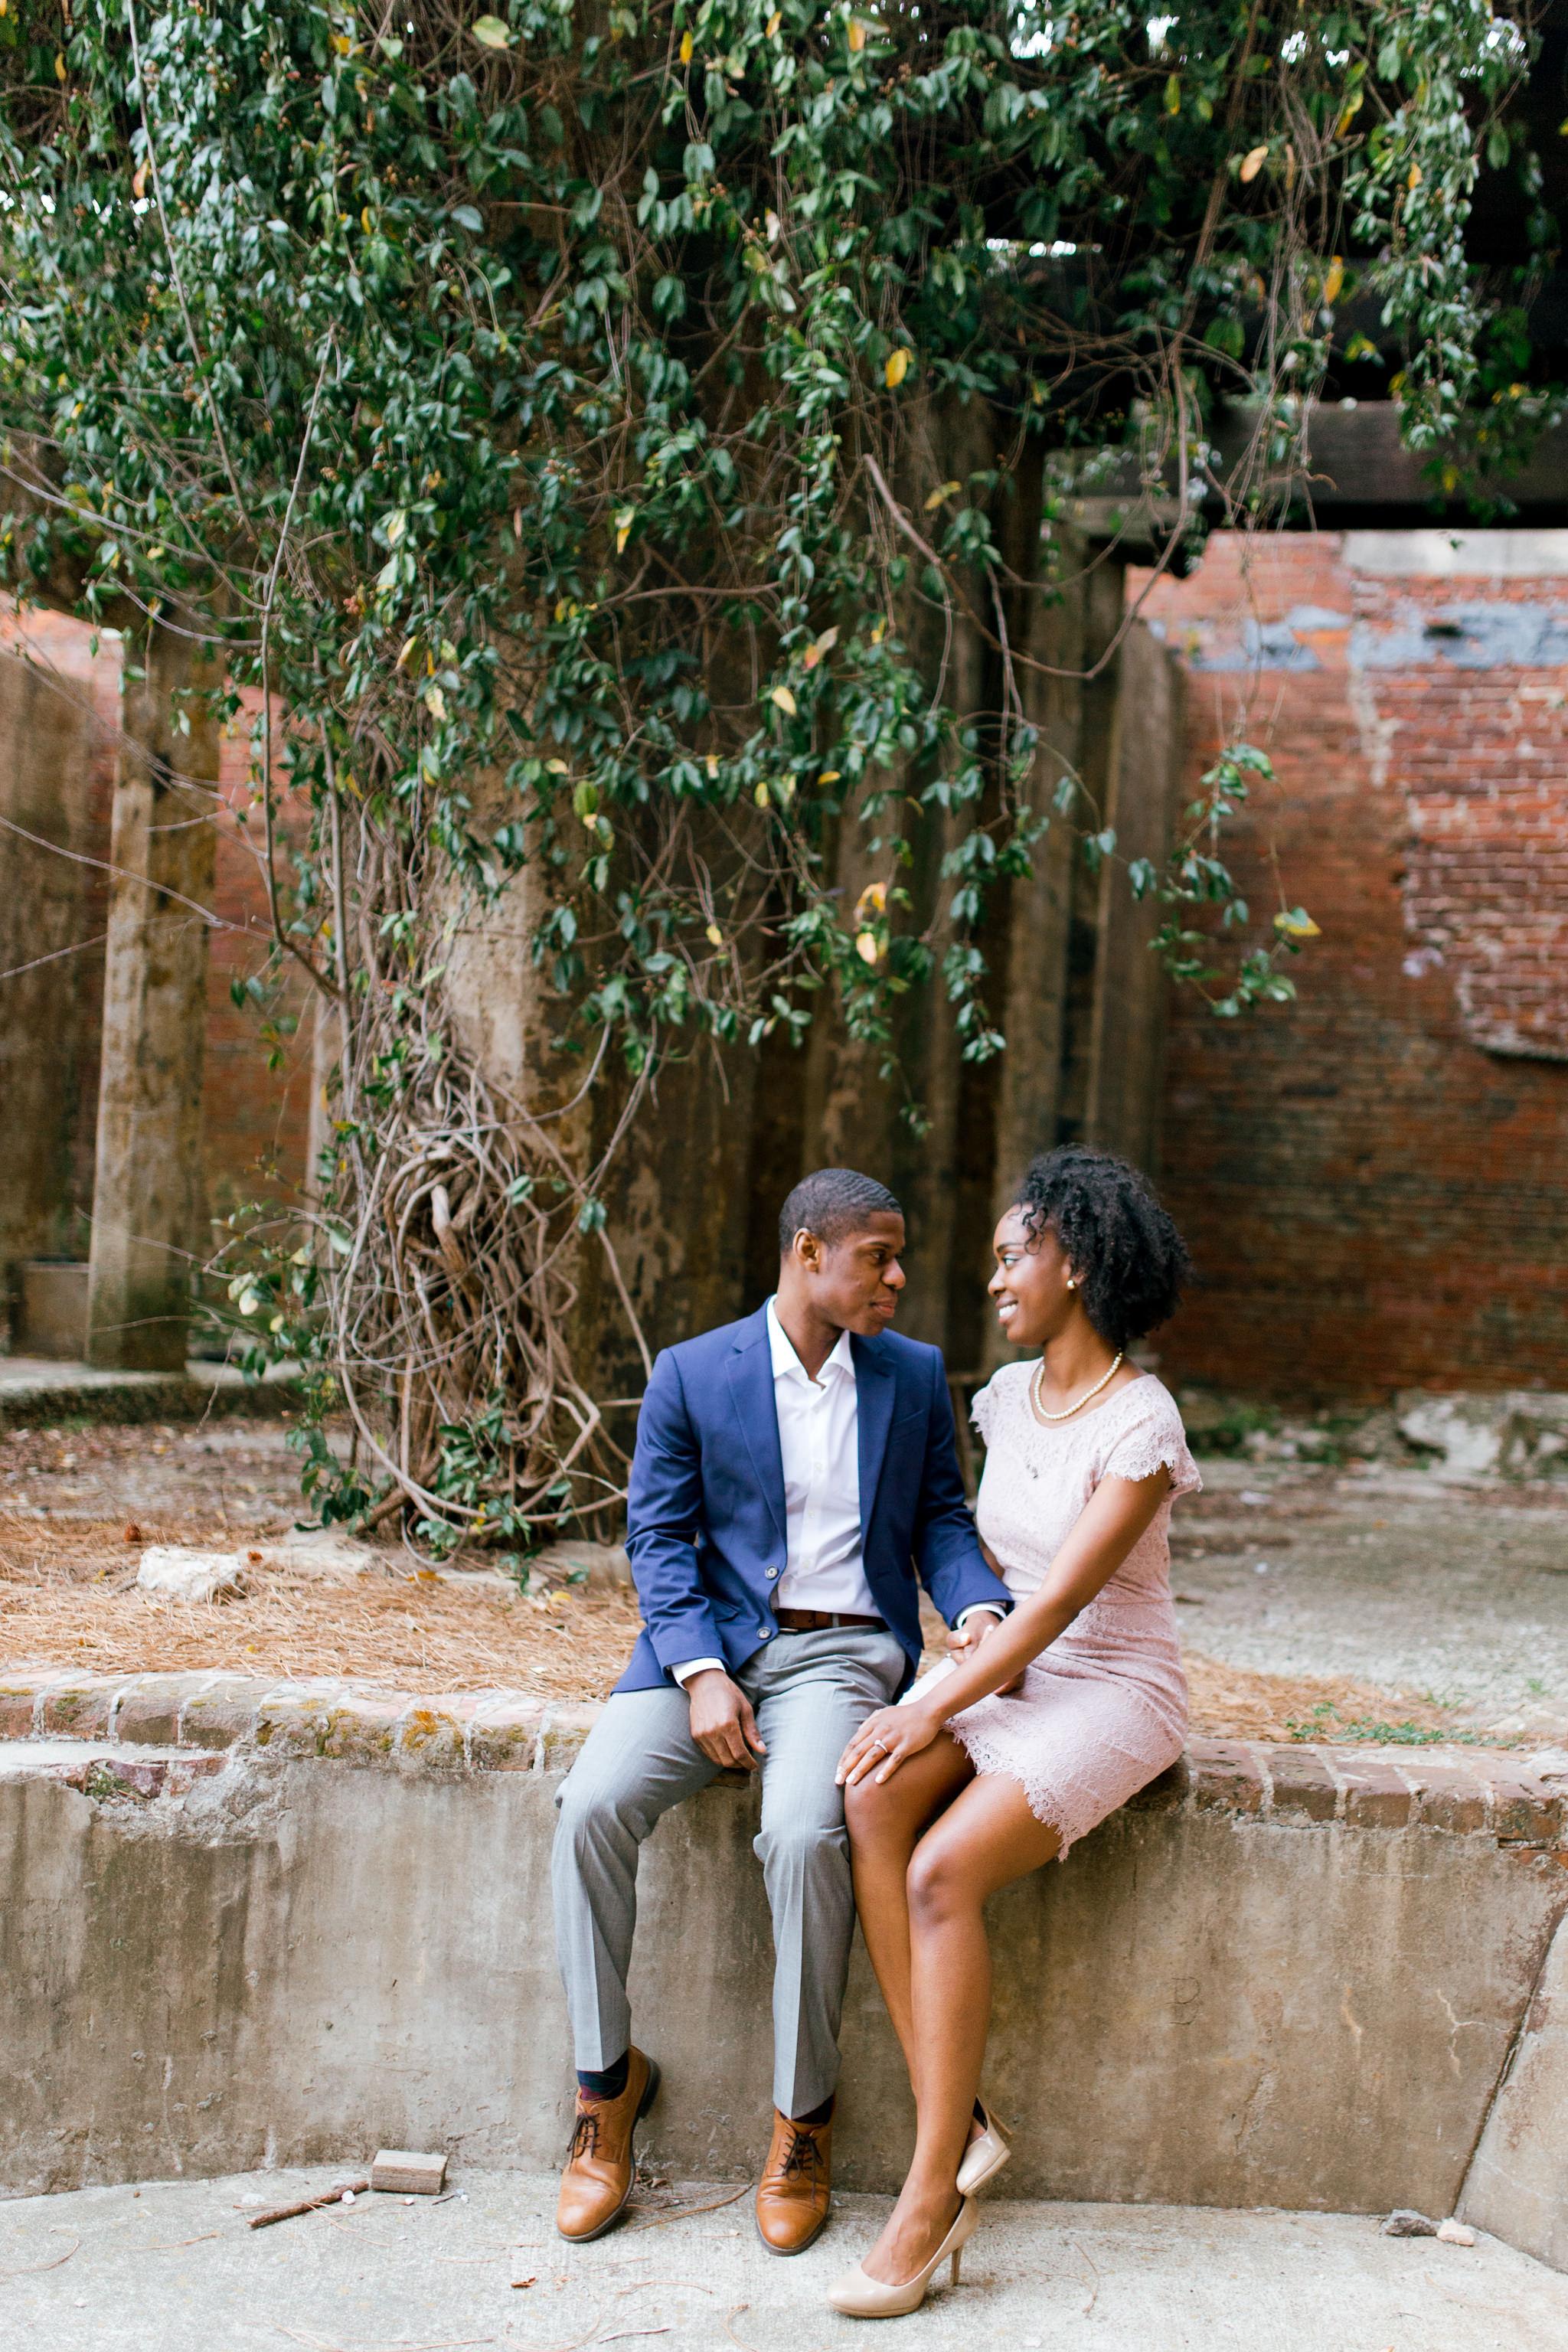 Grant-Park-Atlanta-Engagement-Pictures-Kiyah-C-Photography-20.jpg